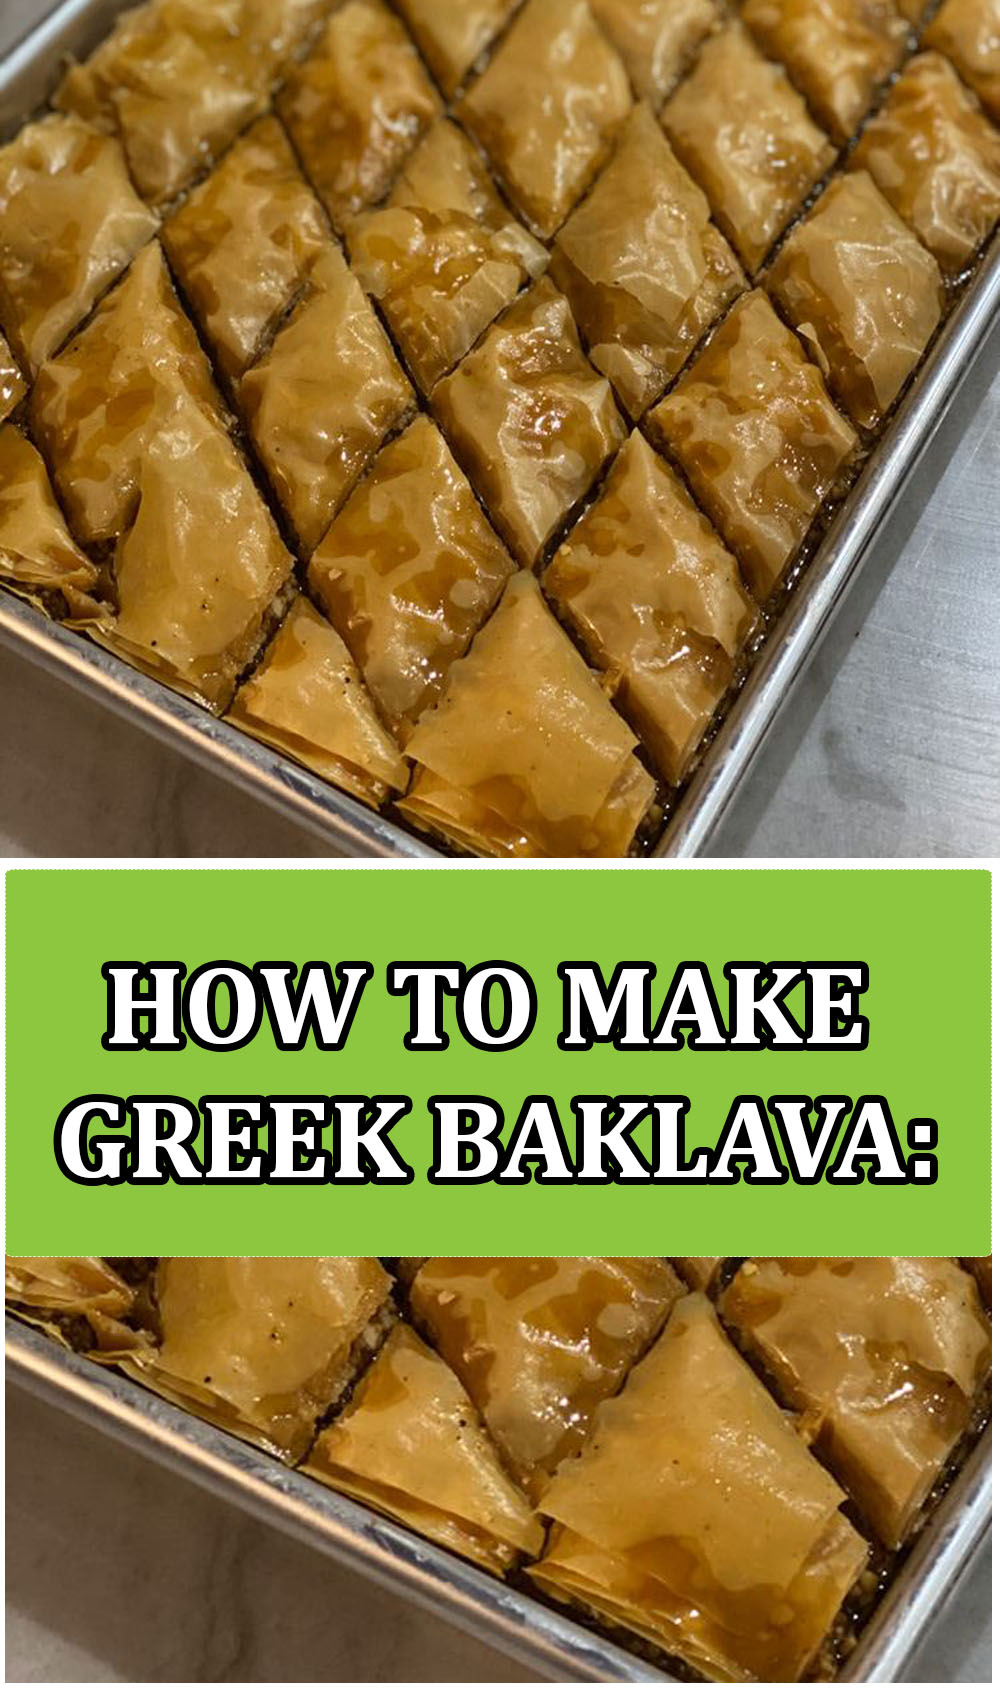 HOW TO MAKE GREEK BAKLAVA